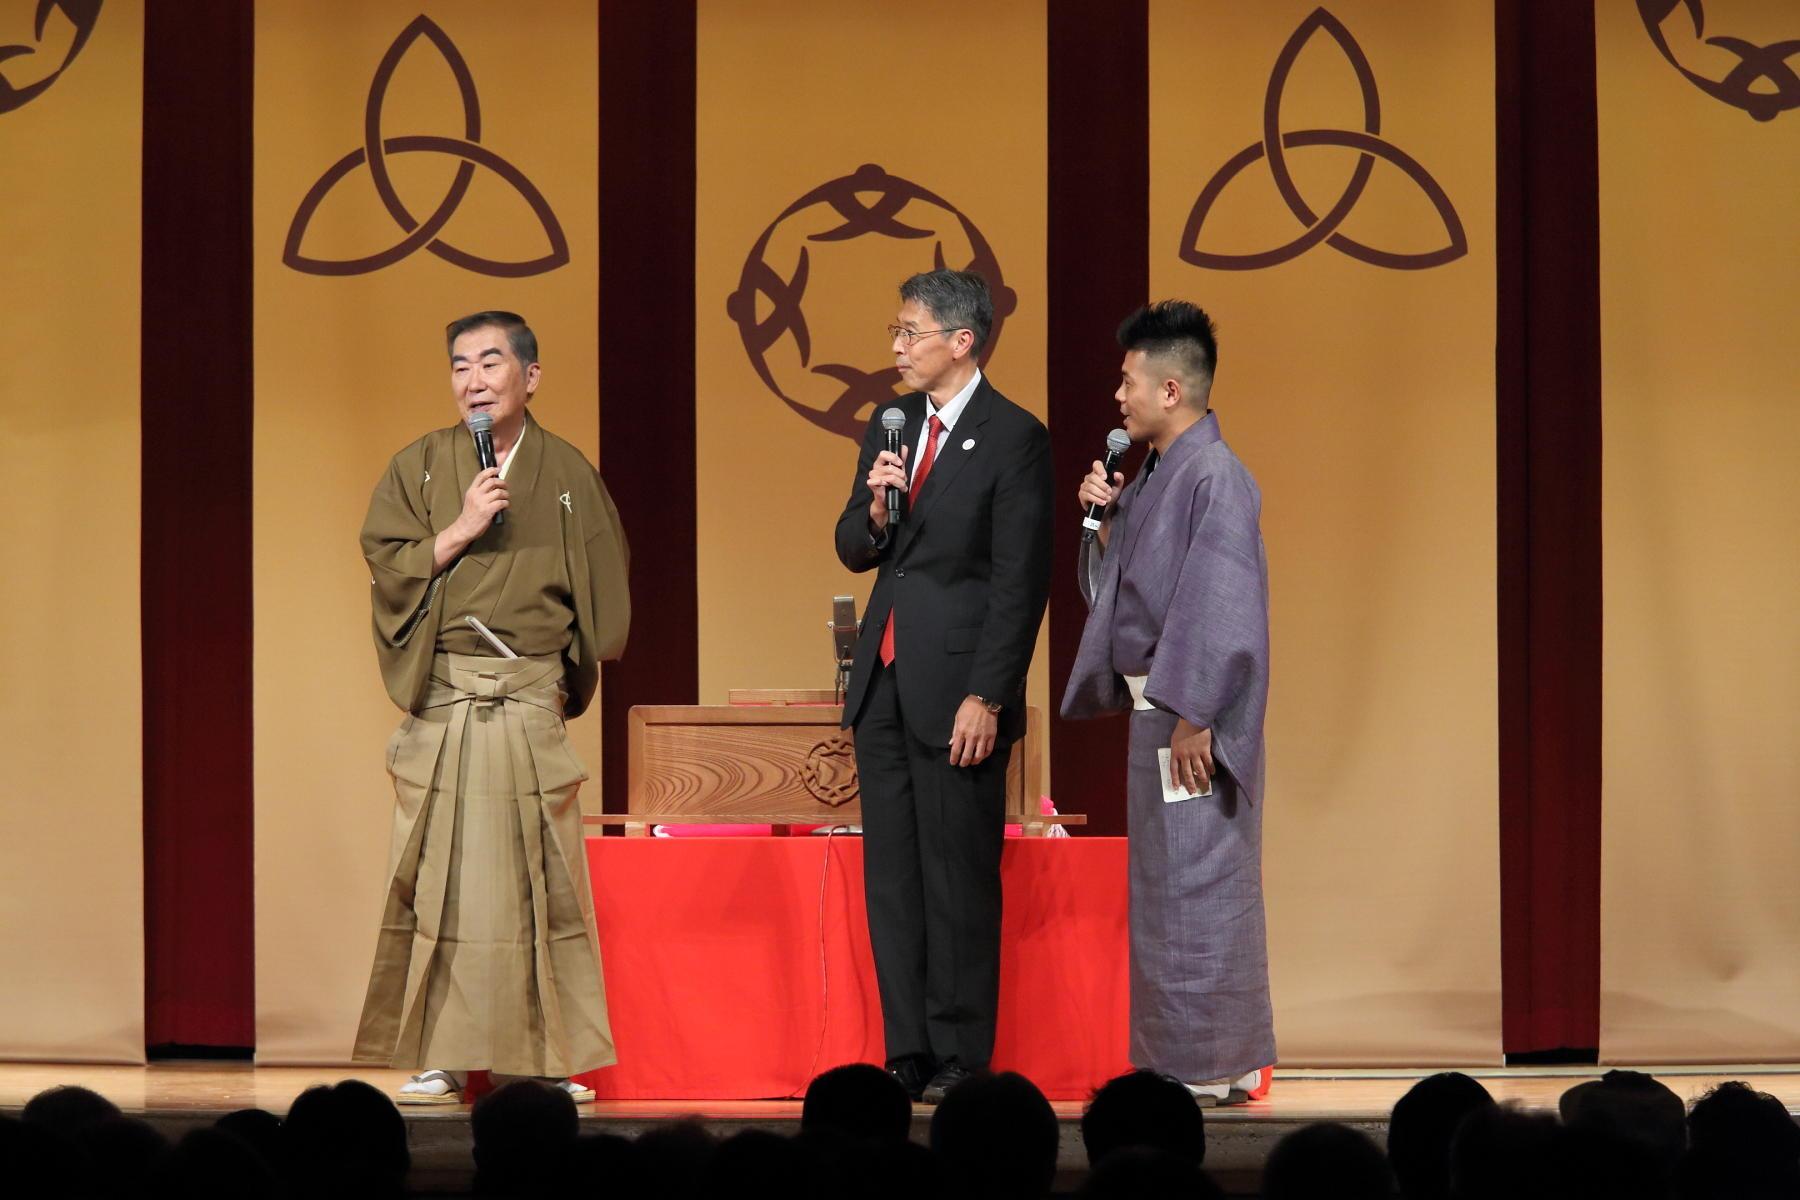 http://news.yoshimoto.co.jp/20180925103531-4fec869c828874dbbecd8ff9f9e01912c262103d.jpg